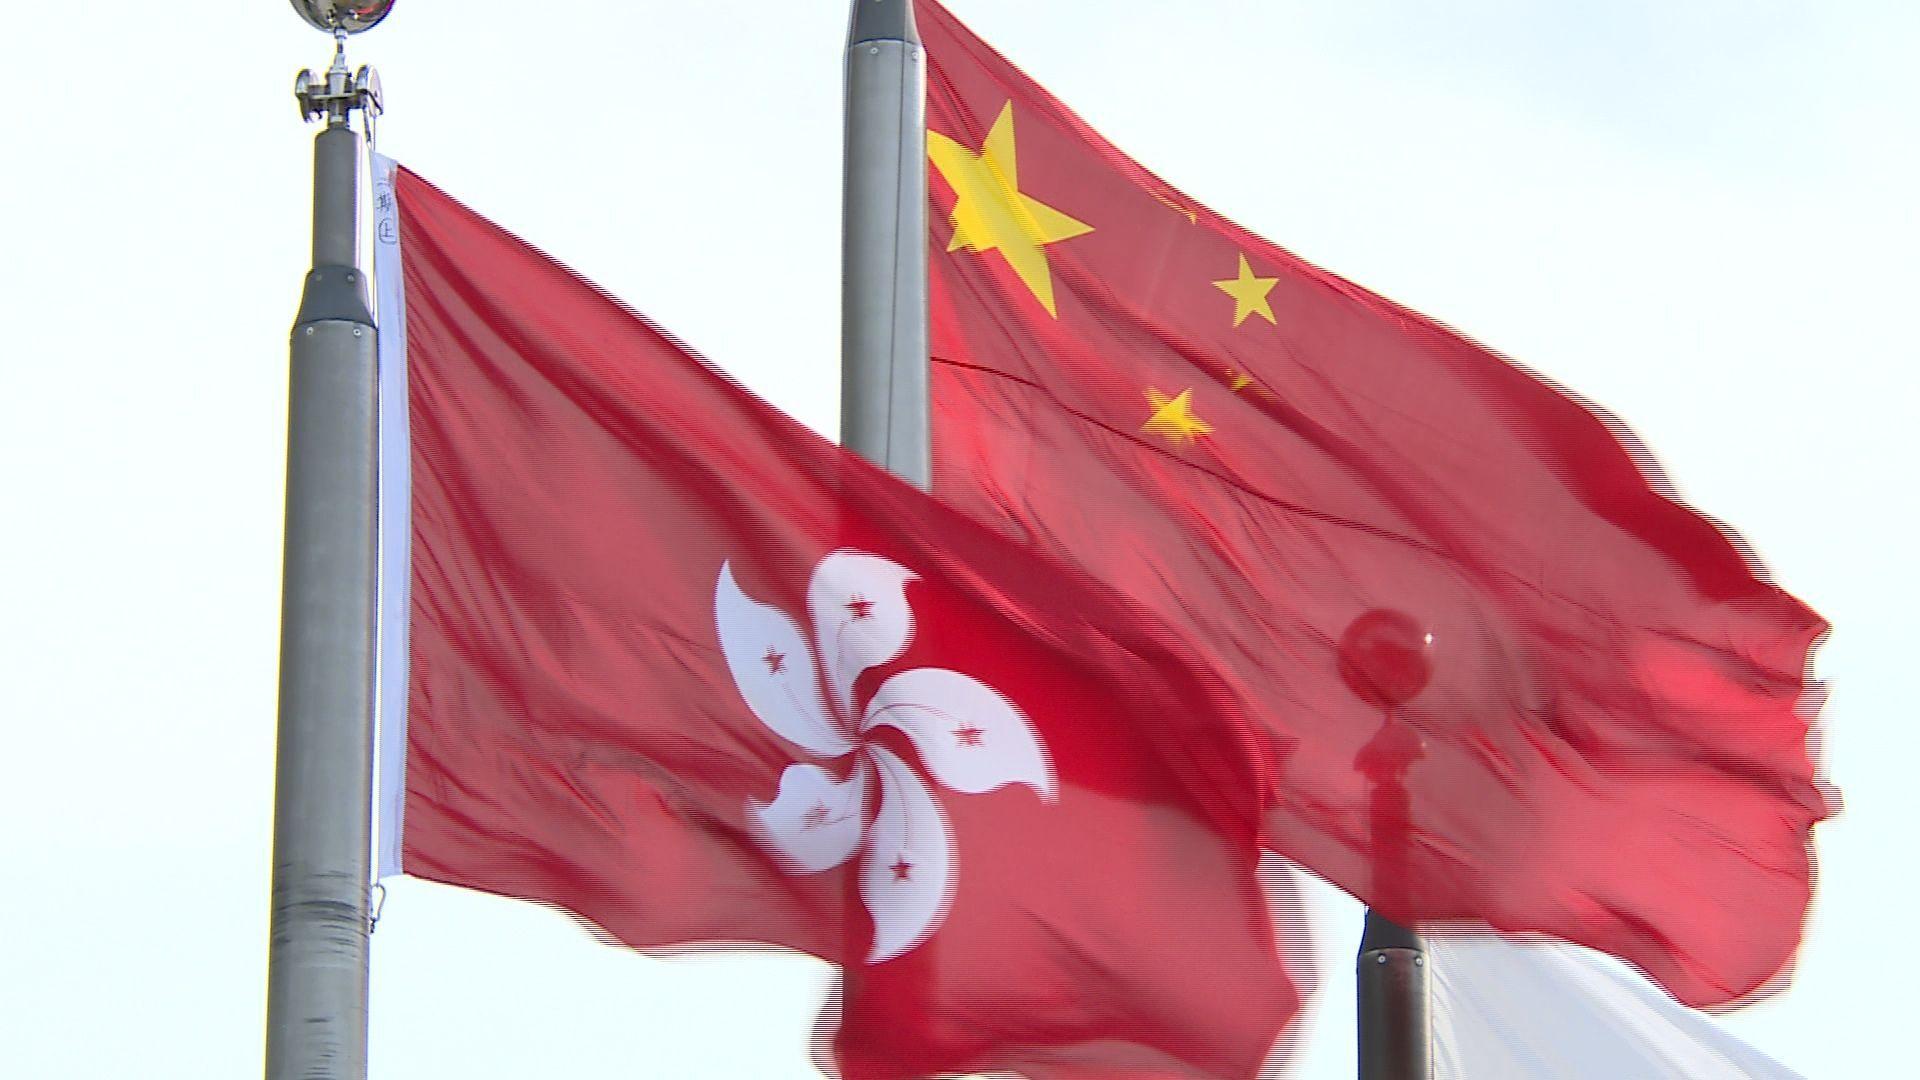 Banderas de Hong Kong y China - Sputnik Mundo, 1920, 05.03.2021